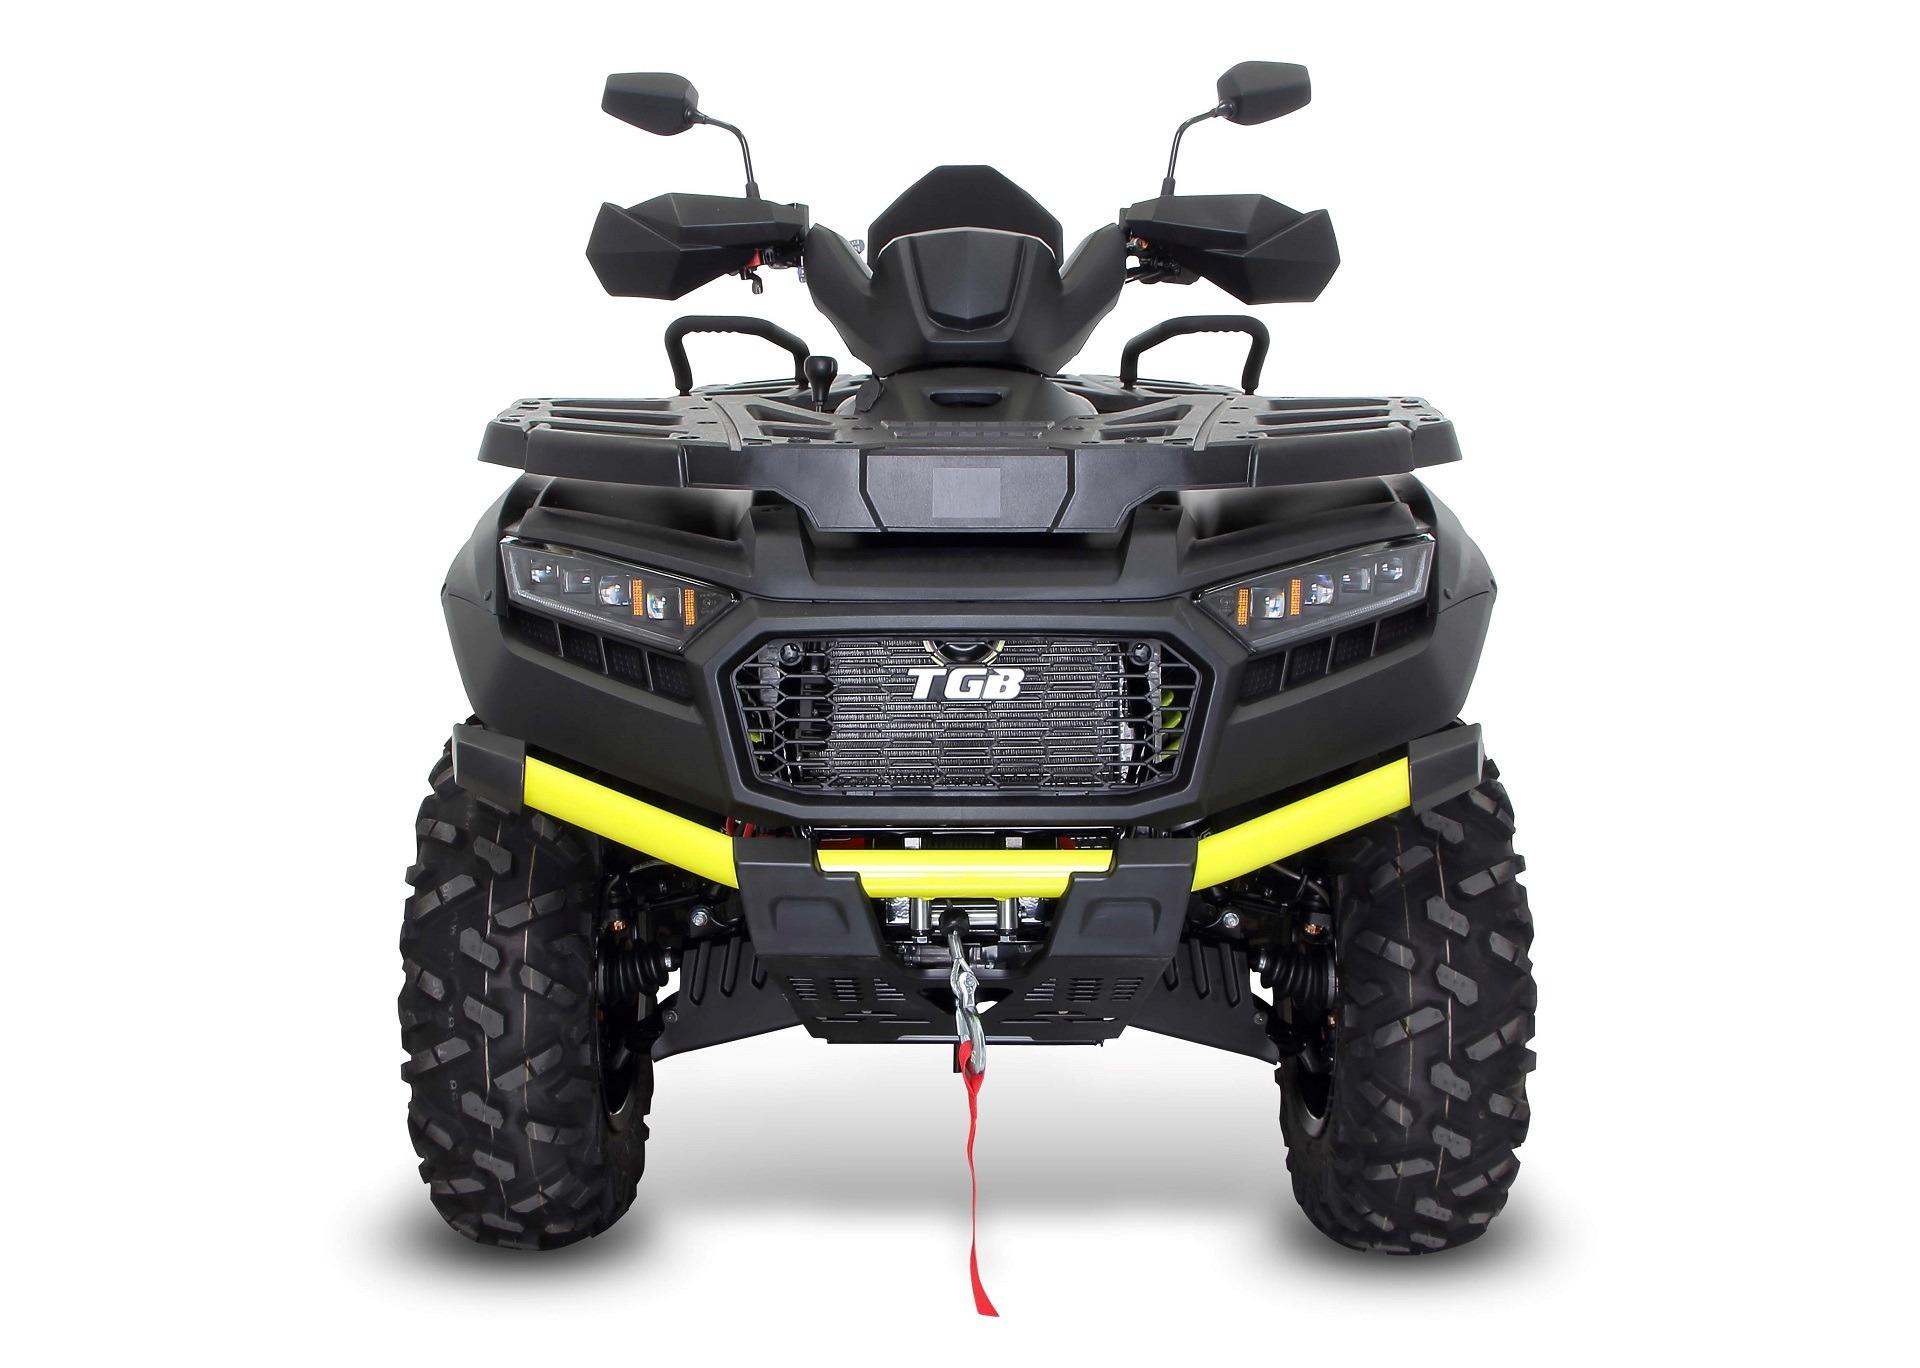 webtgb-1000ltx-front-yellow